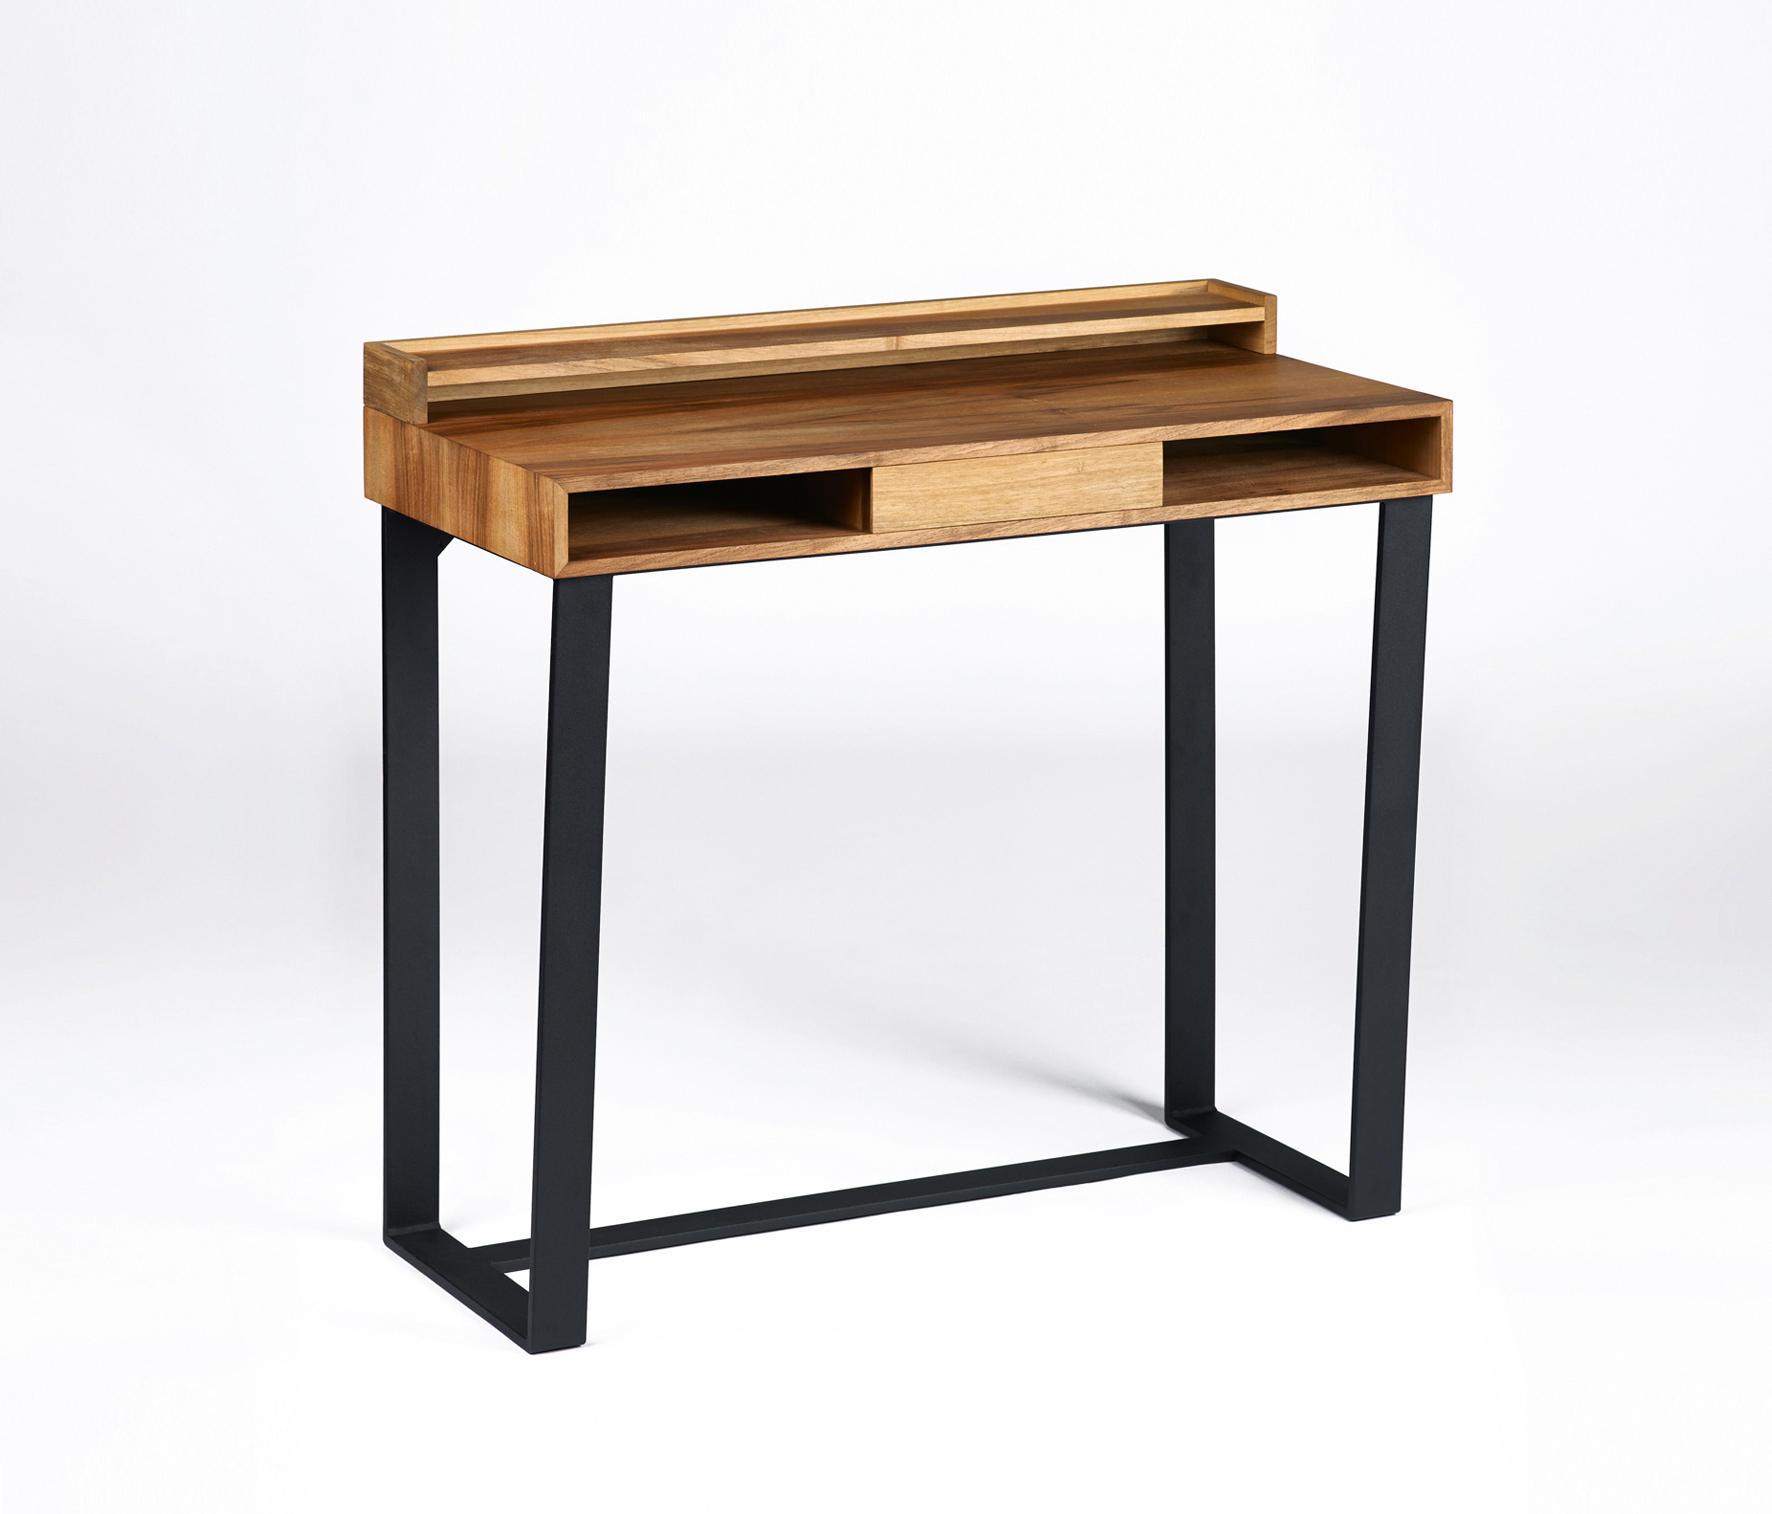 Harvey dressing tables from lambert architonic harvey by lambert dressing tables watchthetrailerfo